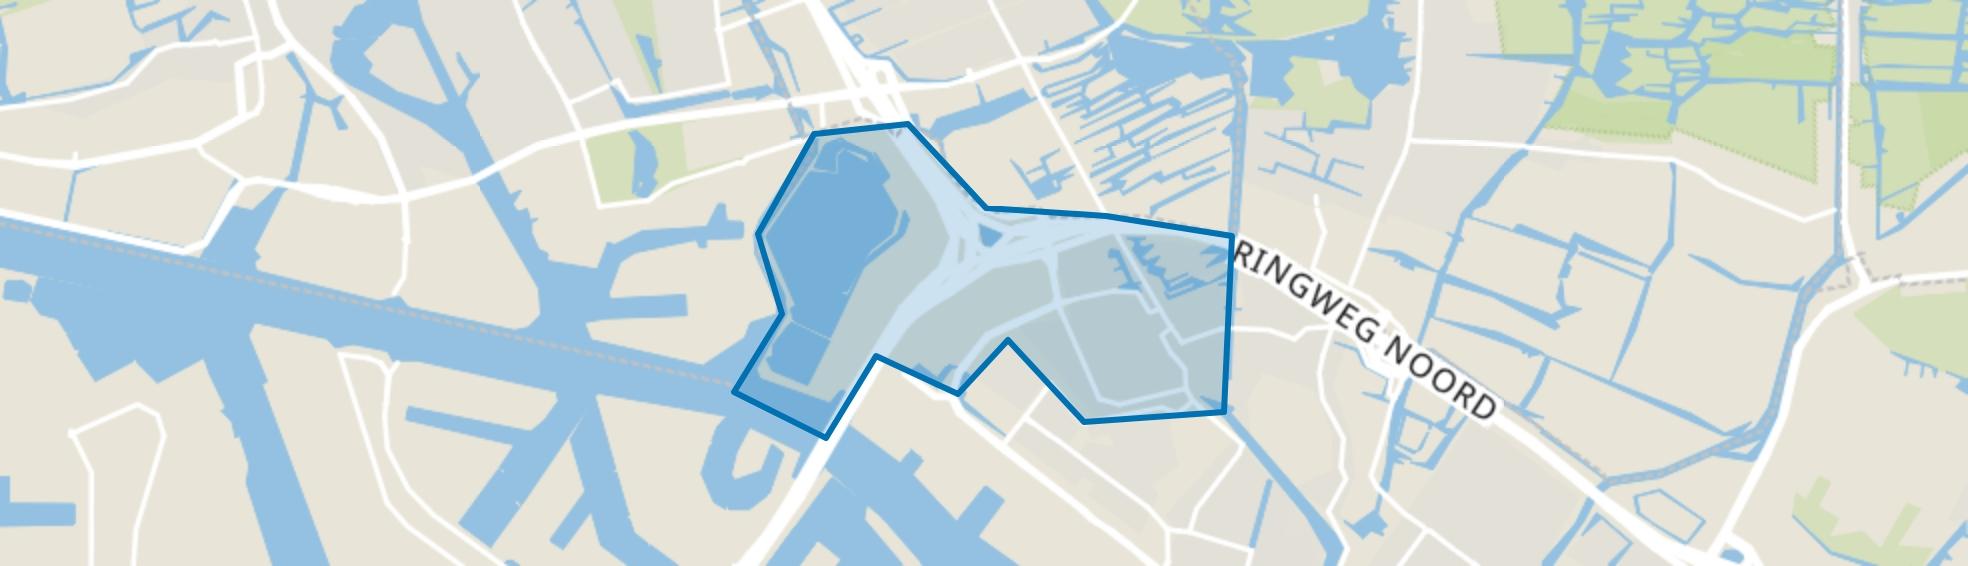 Oostzanerwerf, Amsterdam map